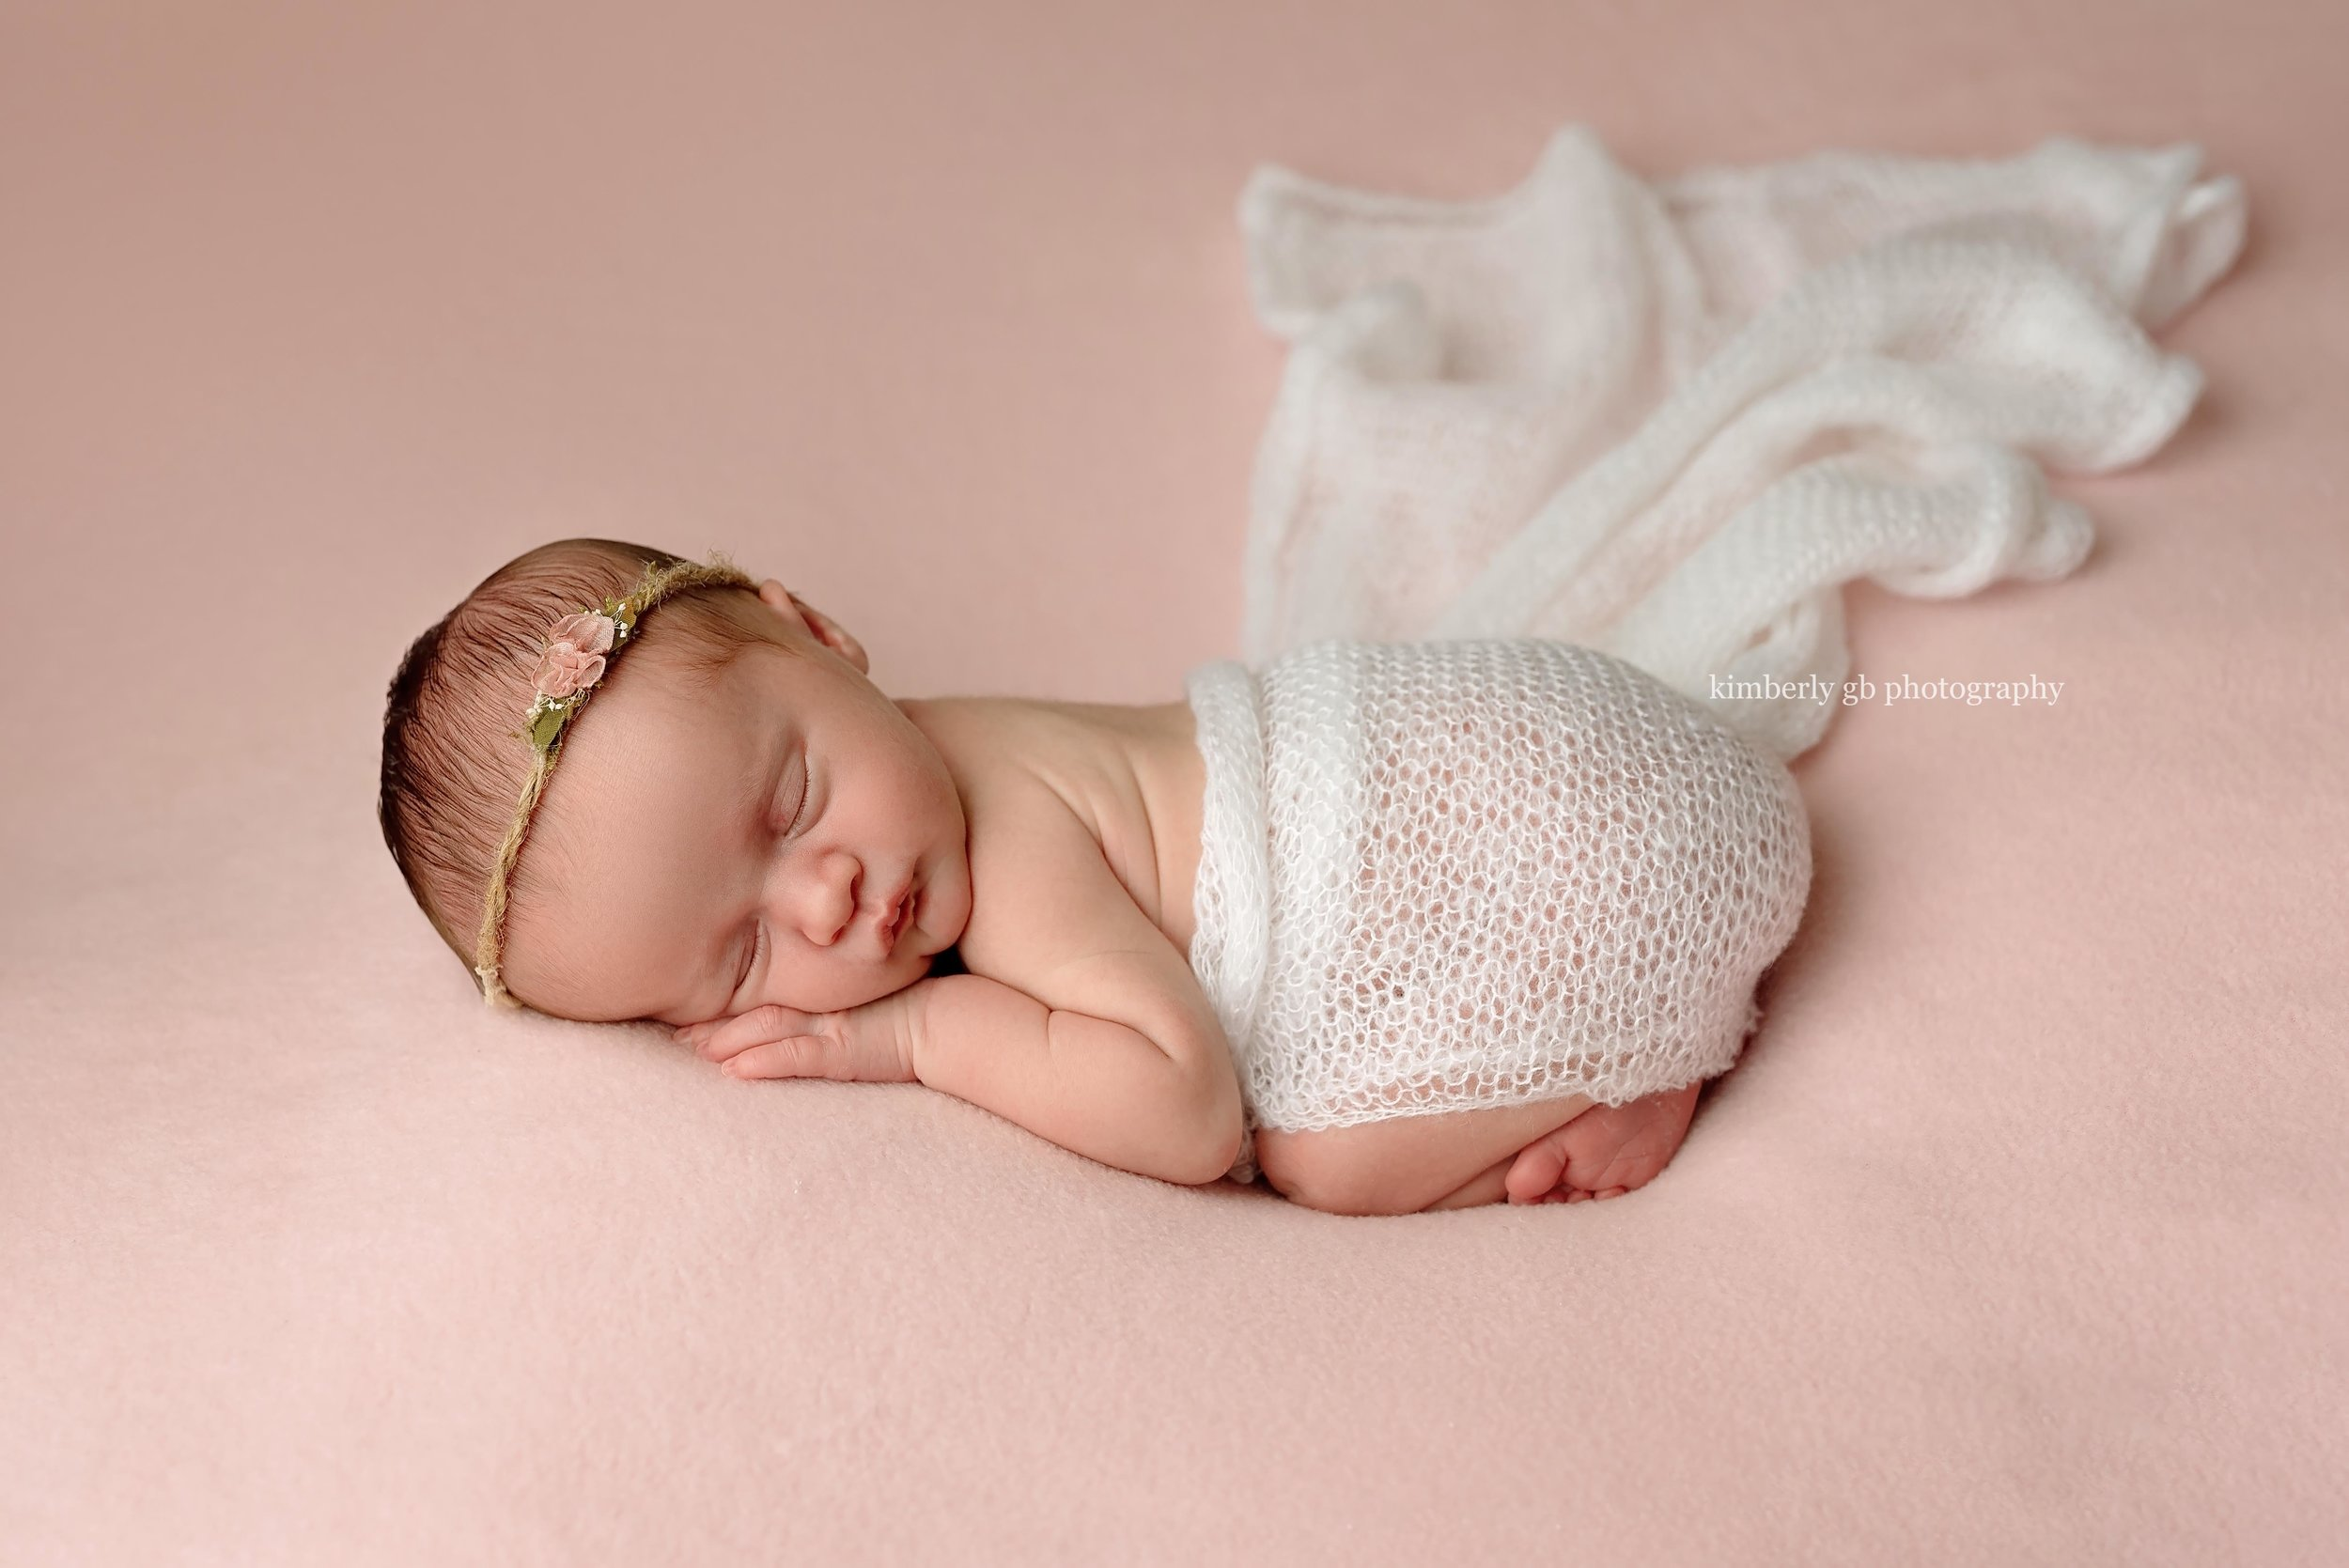 fotografia-de-recien-nacidos-bebes-newborn-en-puerto-rico-kimberly-gb-photography-fotografa-254.jpg